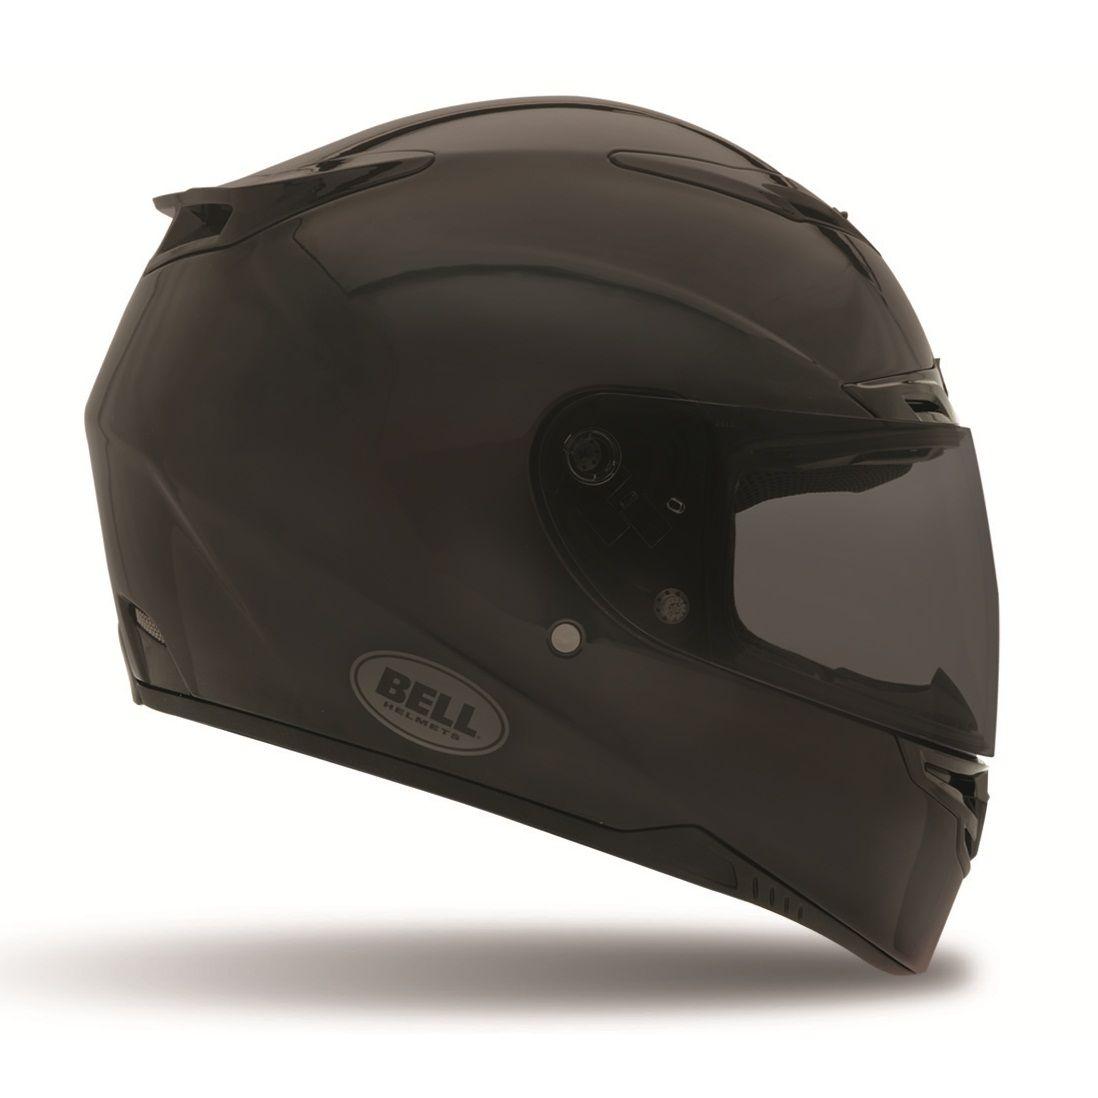 Bell Rs 1 Solid Matte Black Helmet With Images